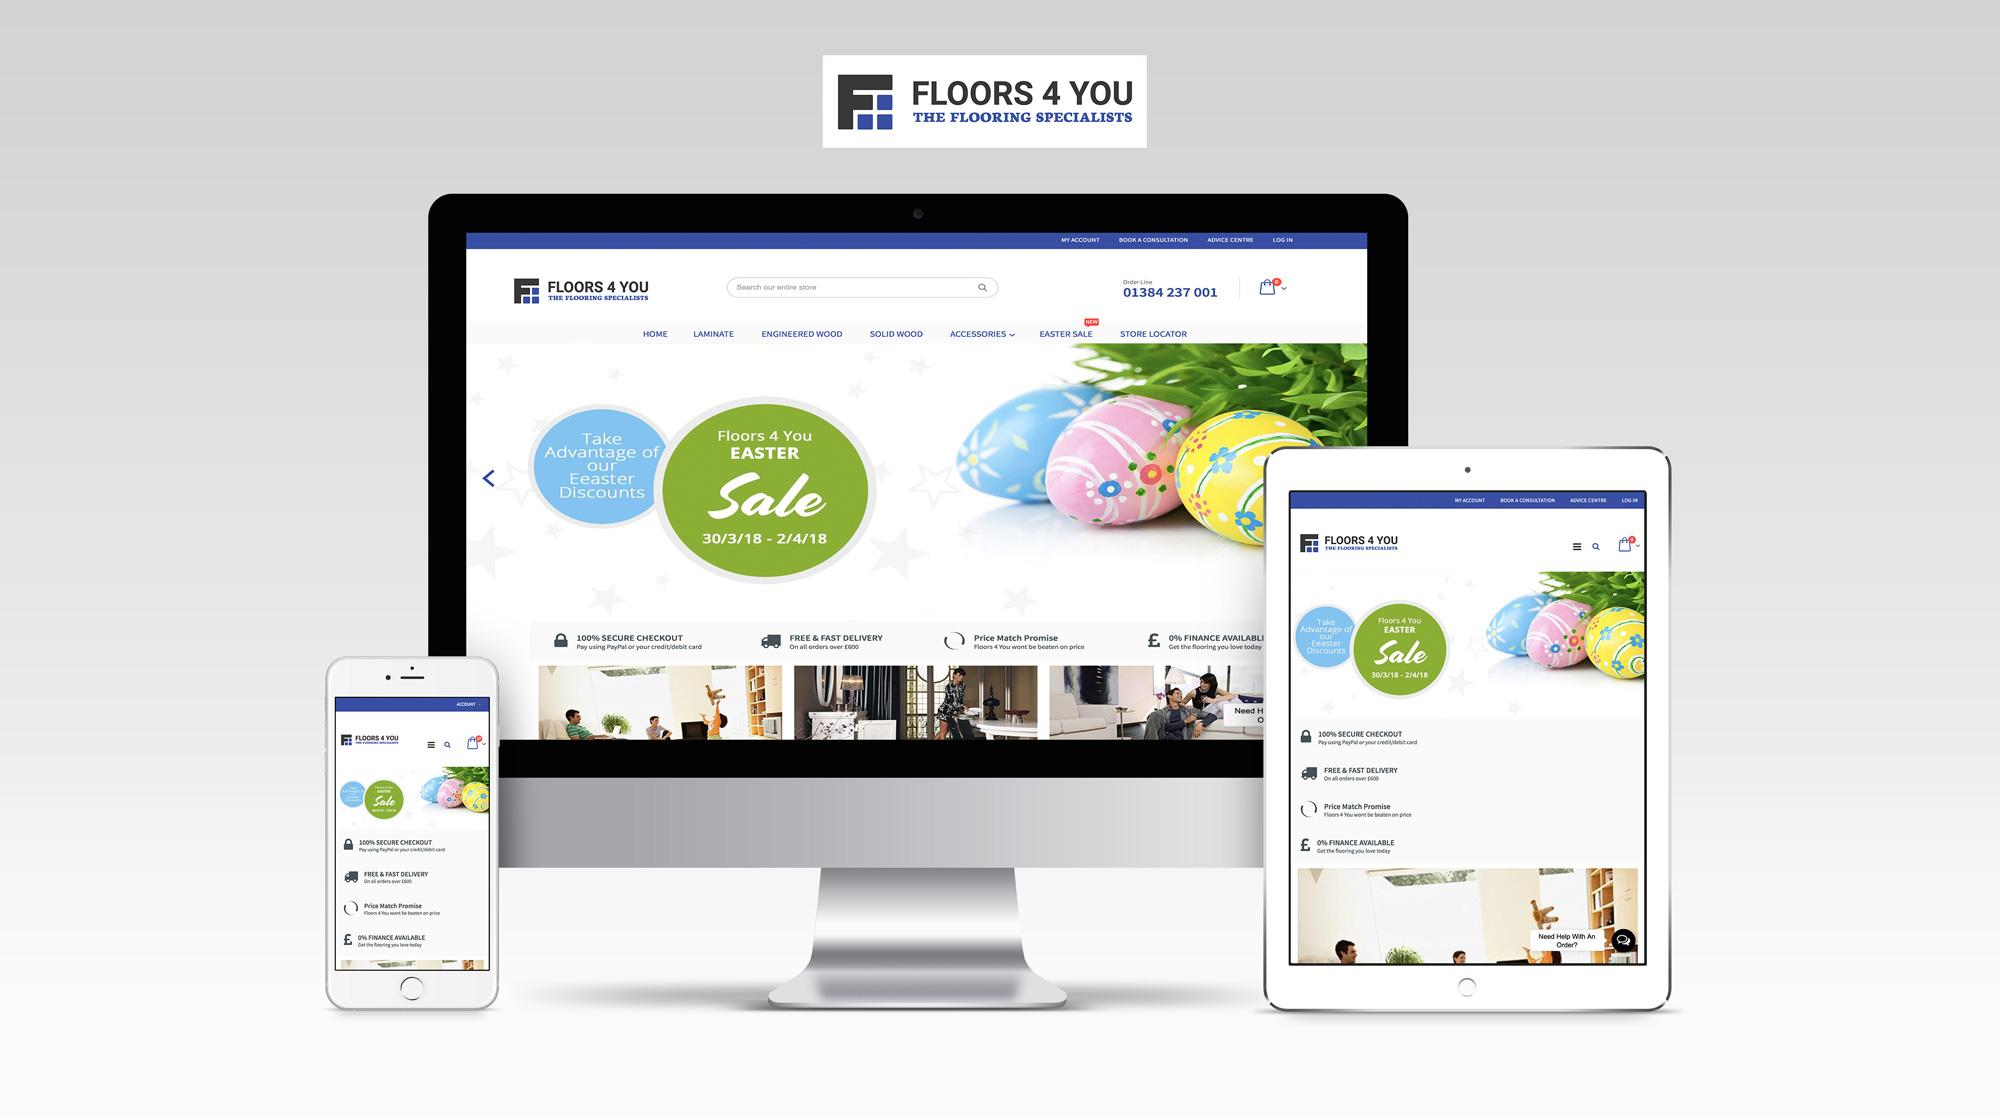 Floors 4 you new website launch